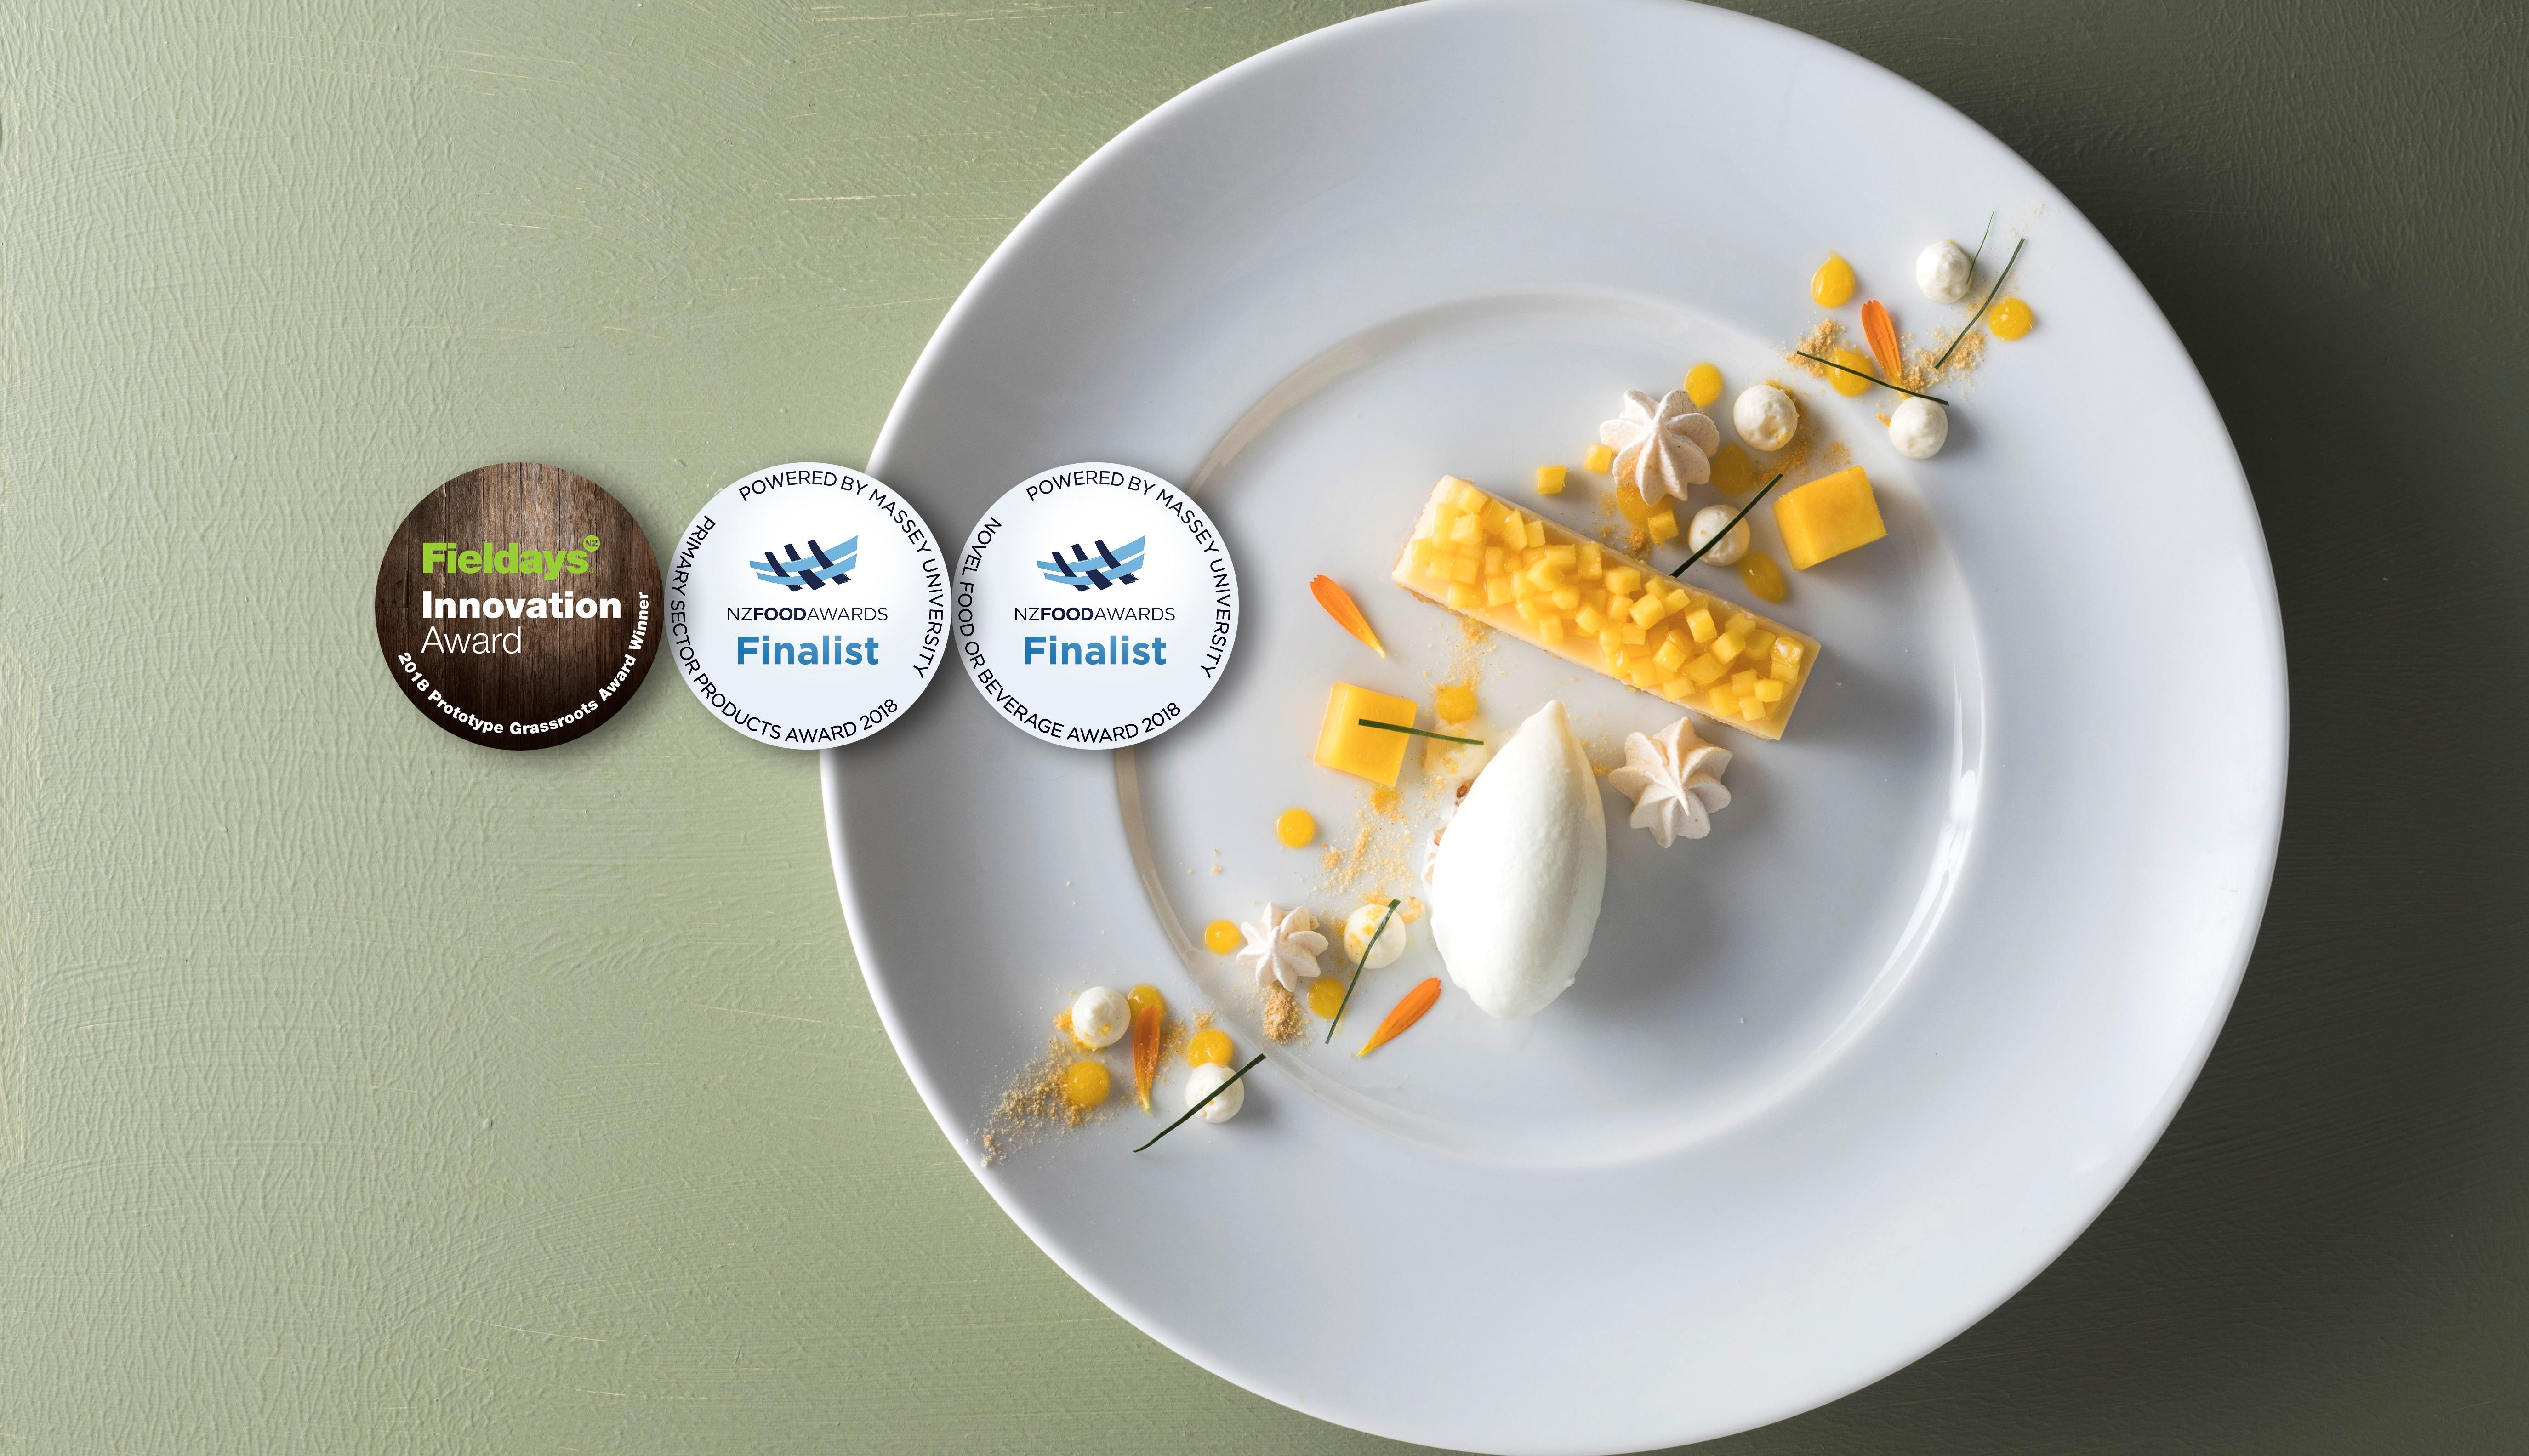 Deer milk hits the spot as finalist in NZ Foods Awards